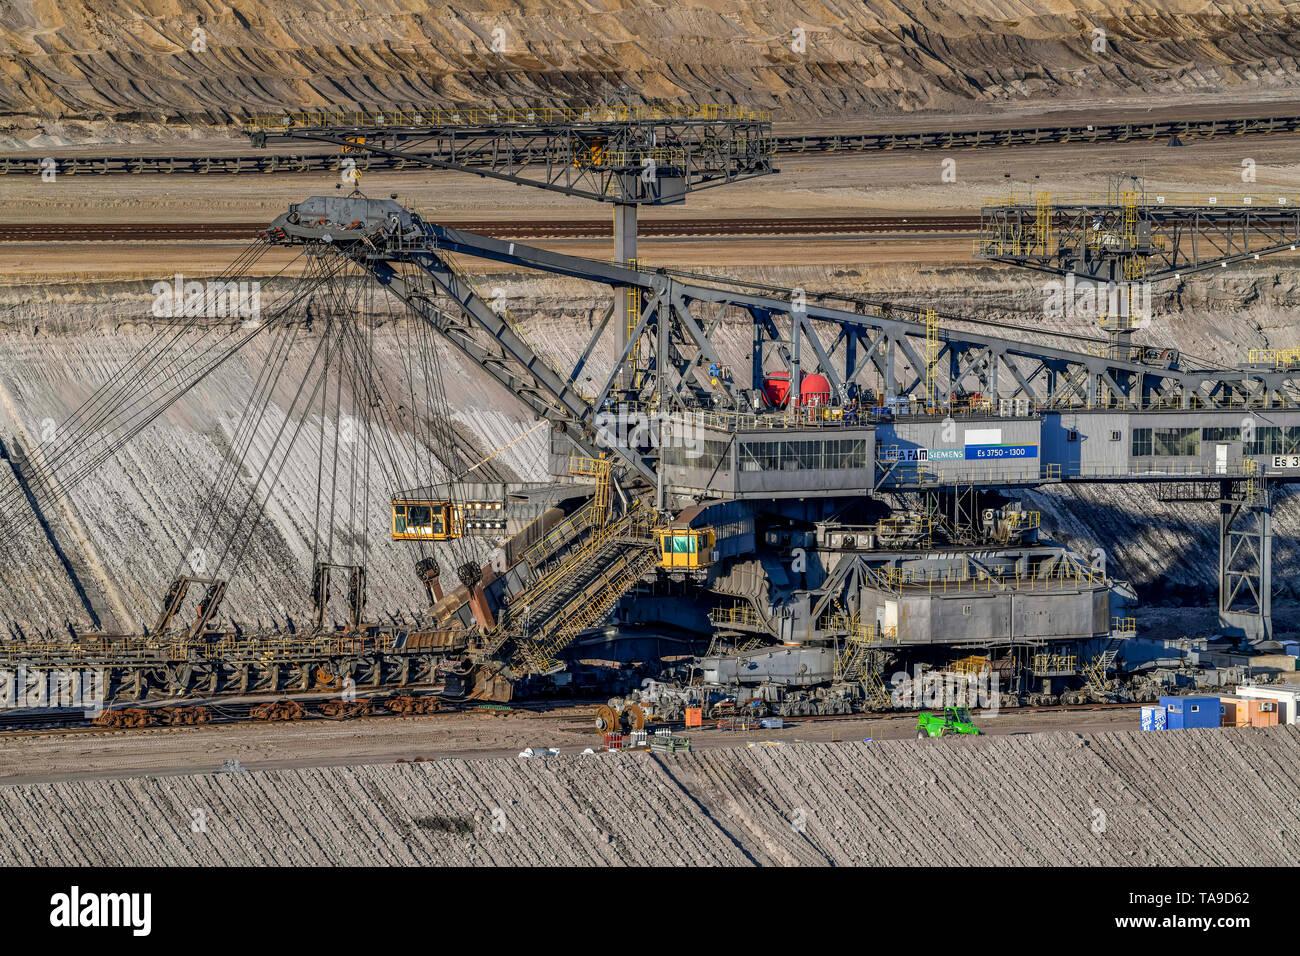 Overburden excavator, brown coal opencast mining Cottbus the north, Jänschwalde, Brandenburg, Germany, Abraumbagger, Braunkohle Tagebau Cottbus Nord,  Stock Photo